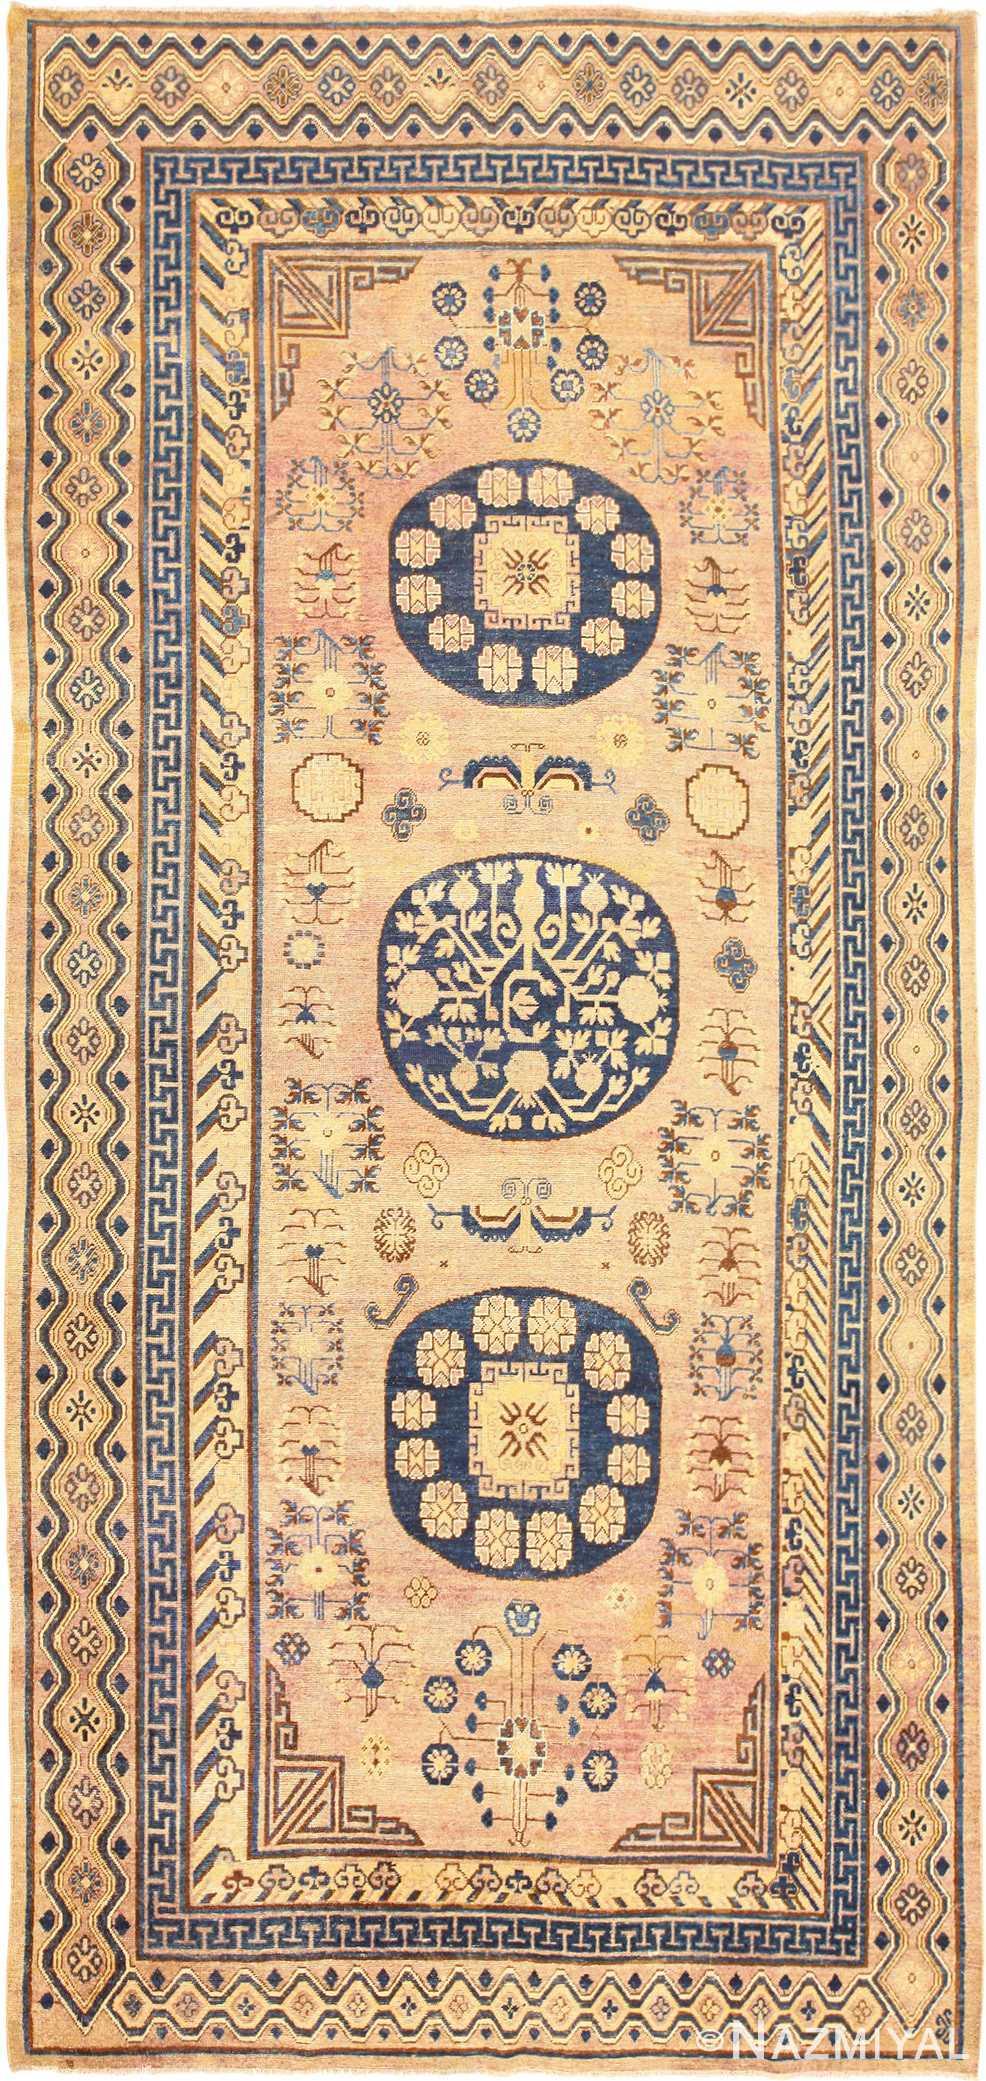 Antique Khotan Rug 49047